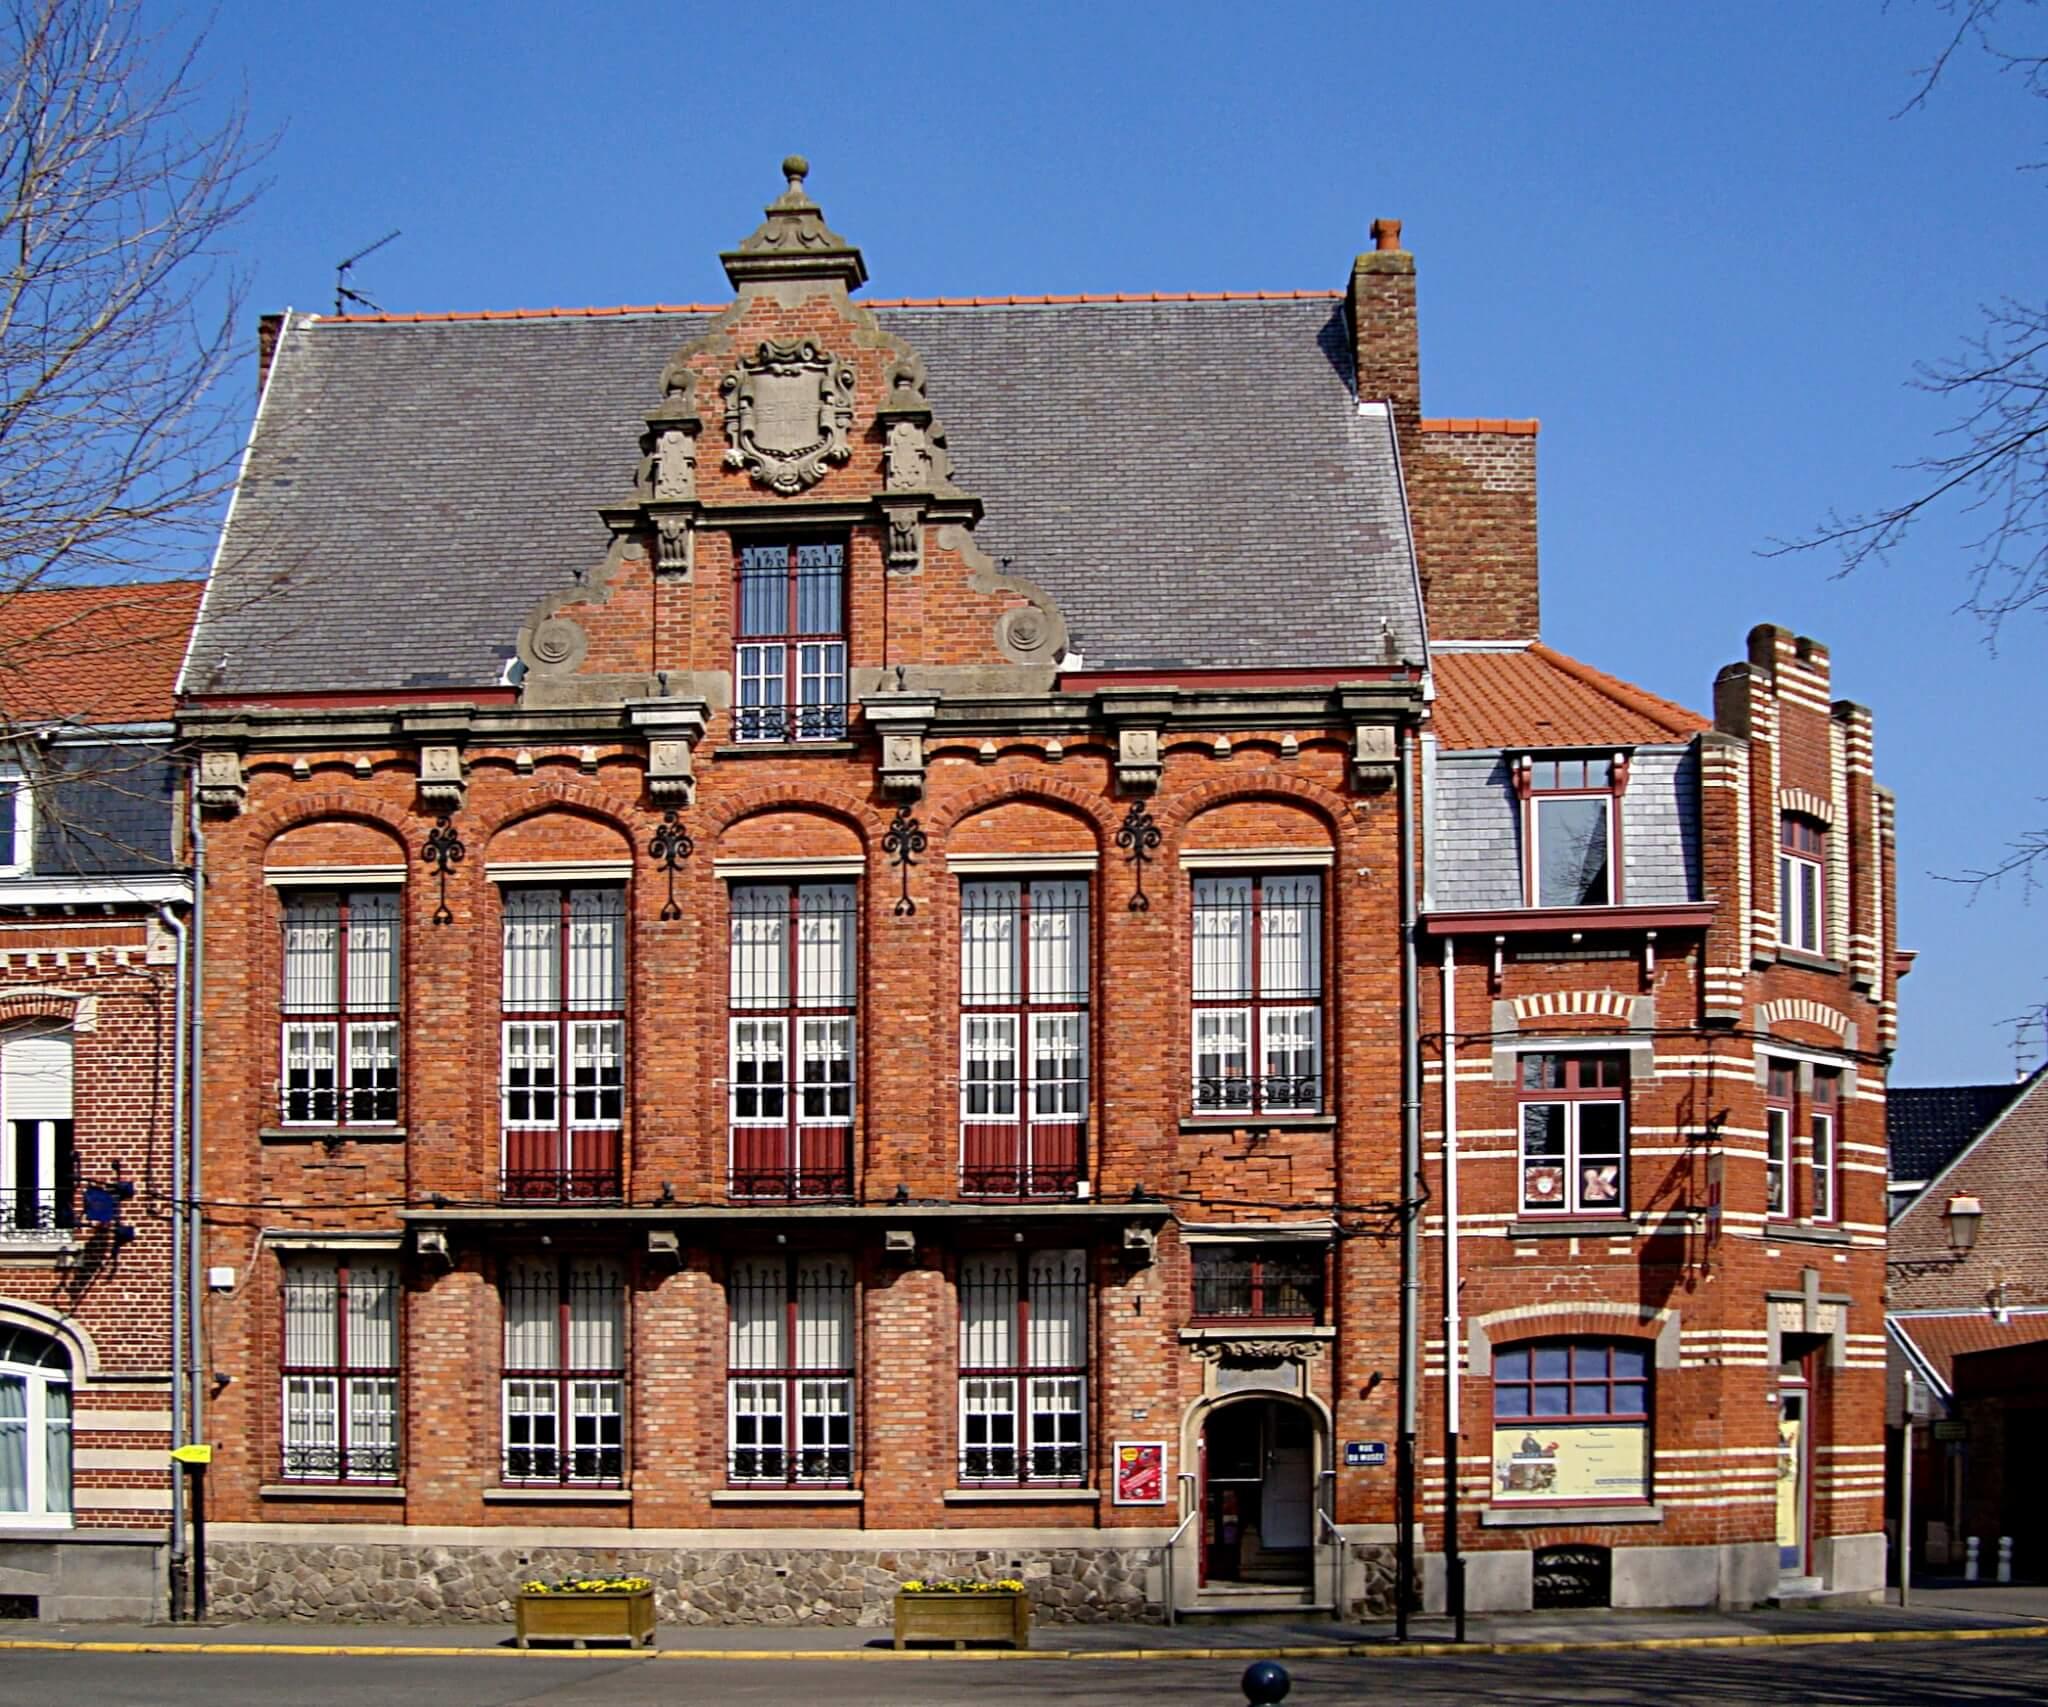 Musée Benoît-De-Puydt, Bailleul